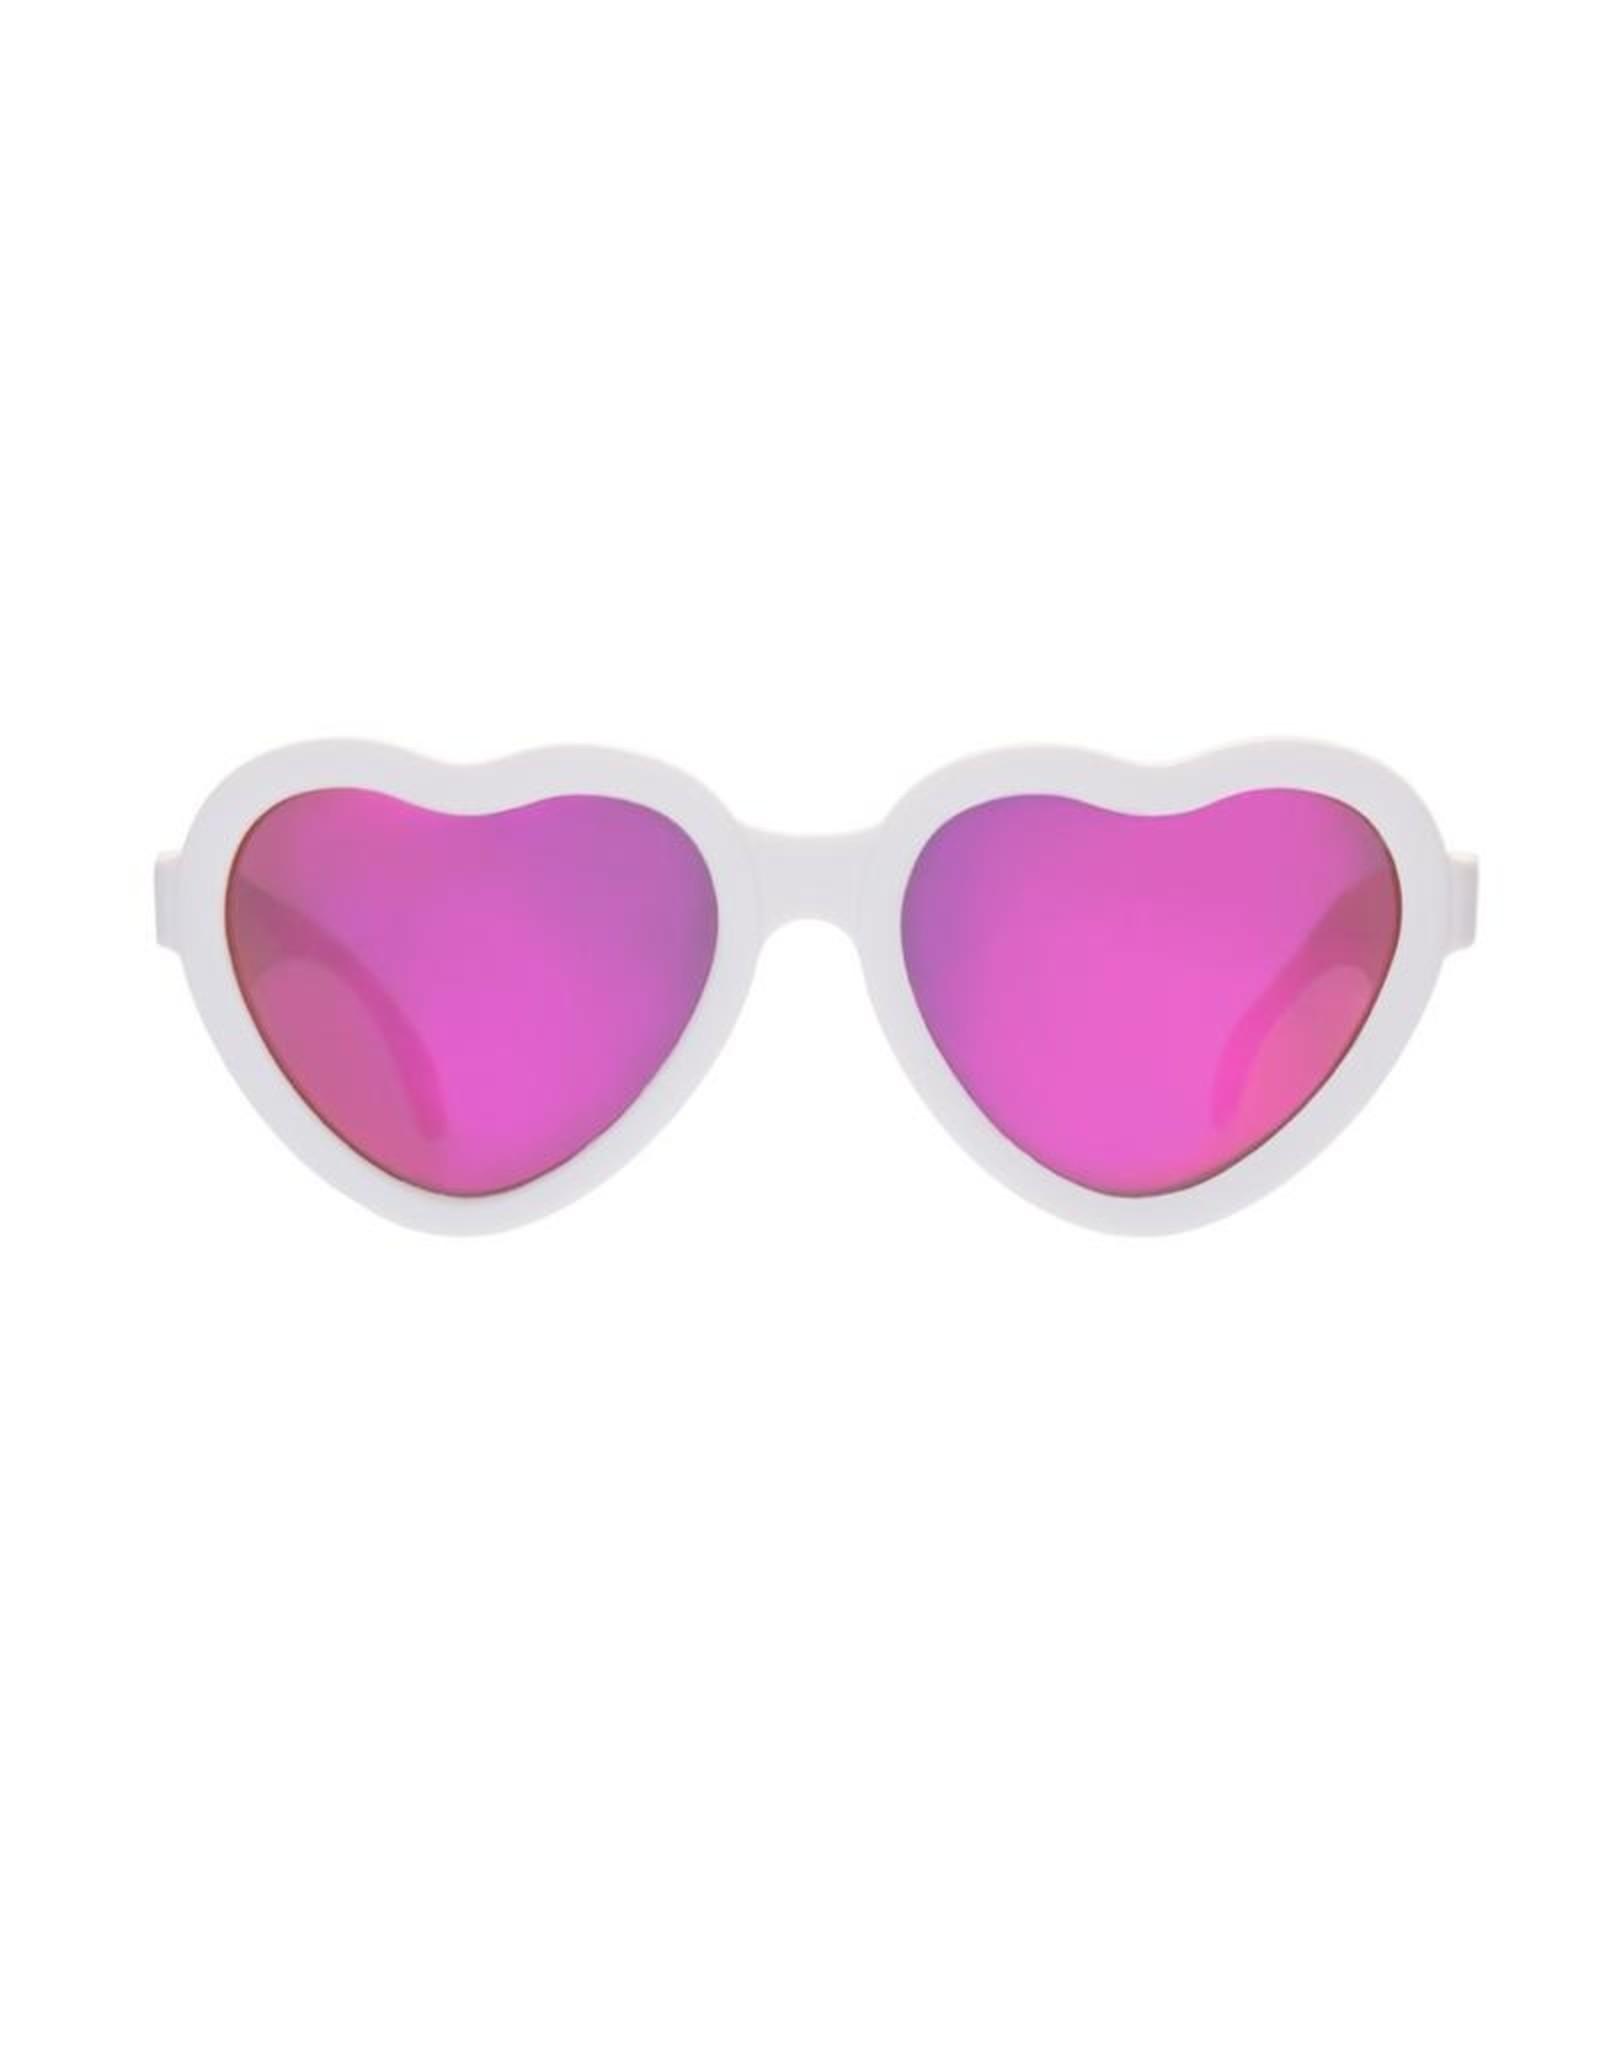 Babiators SweetHeart, Polarized Sunglasses, Pink